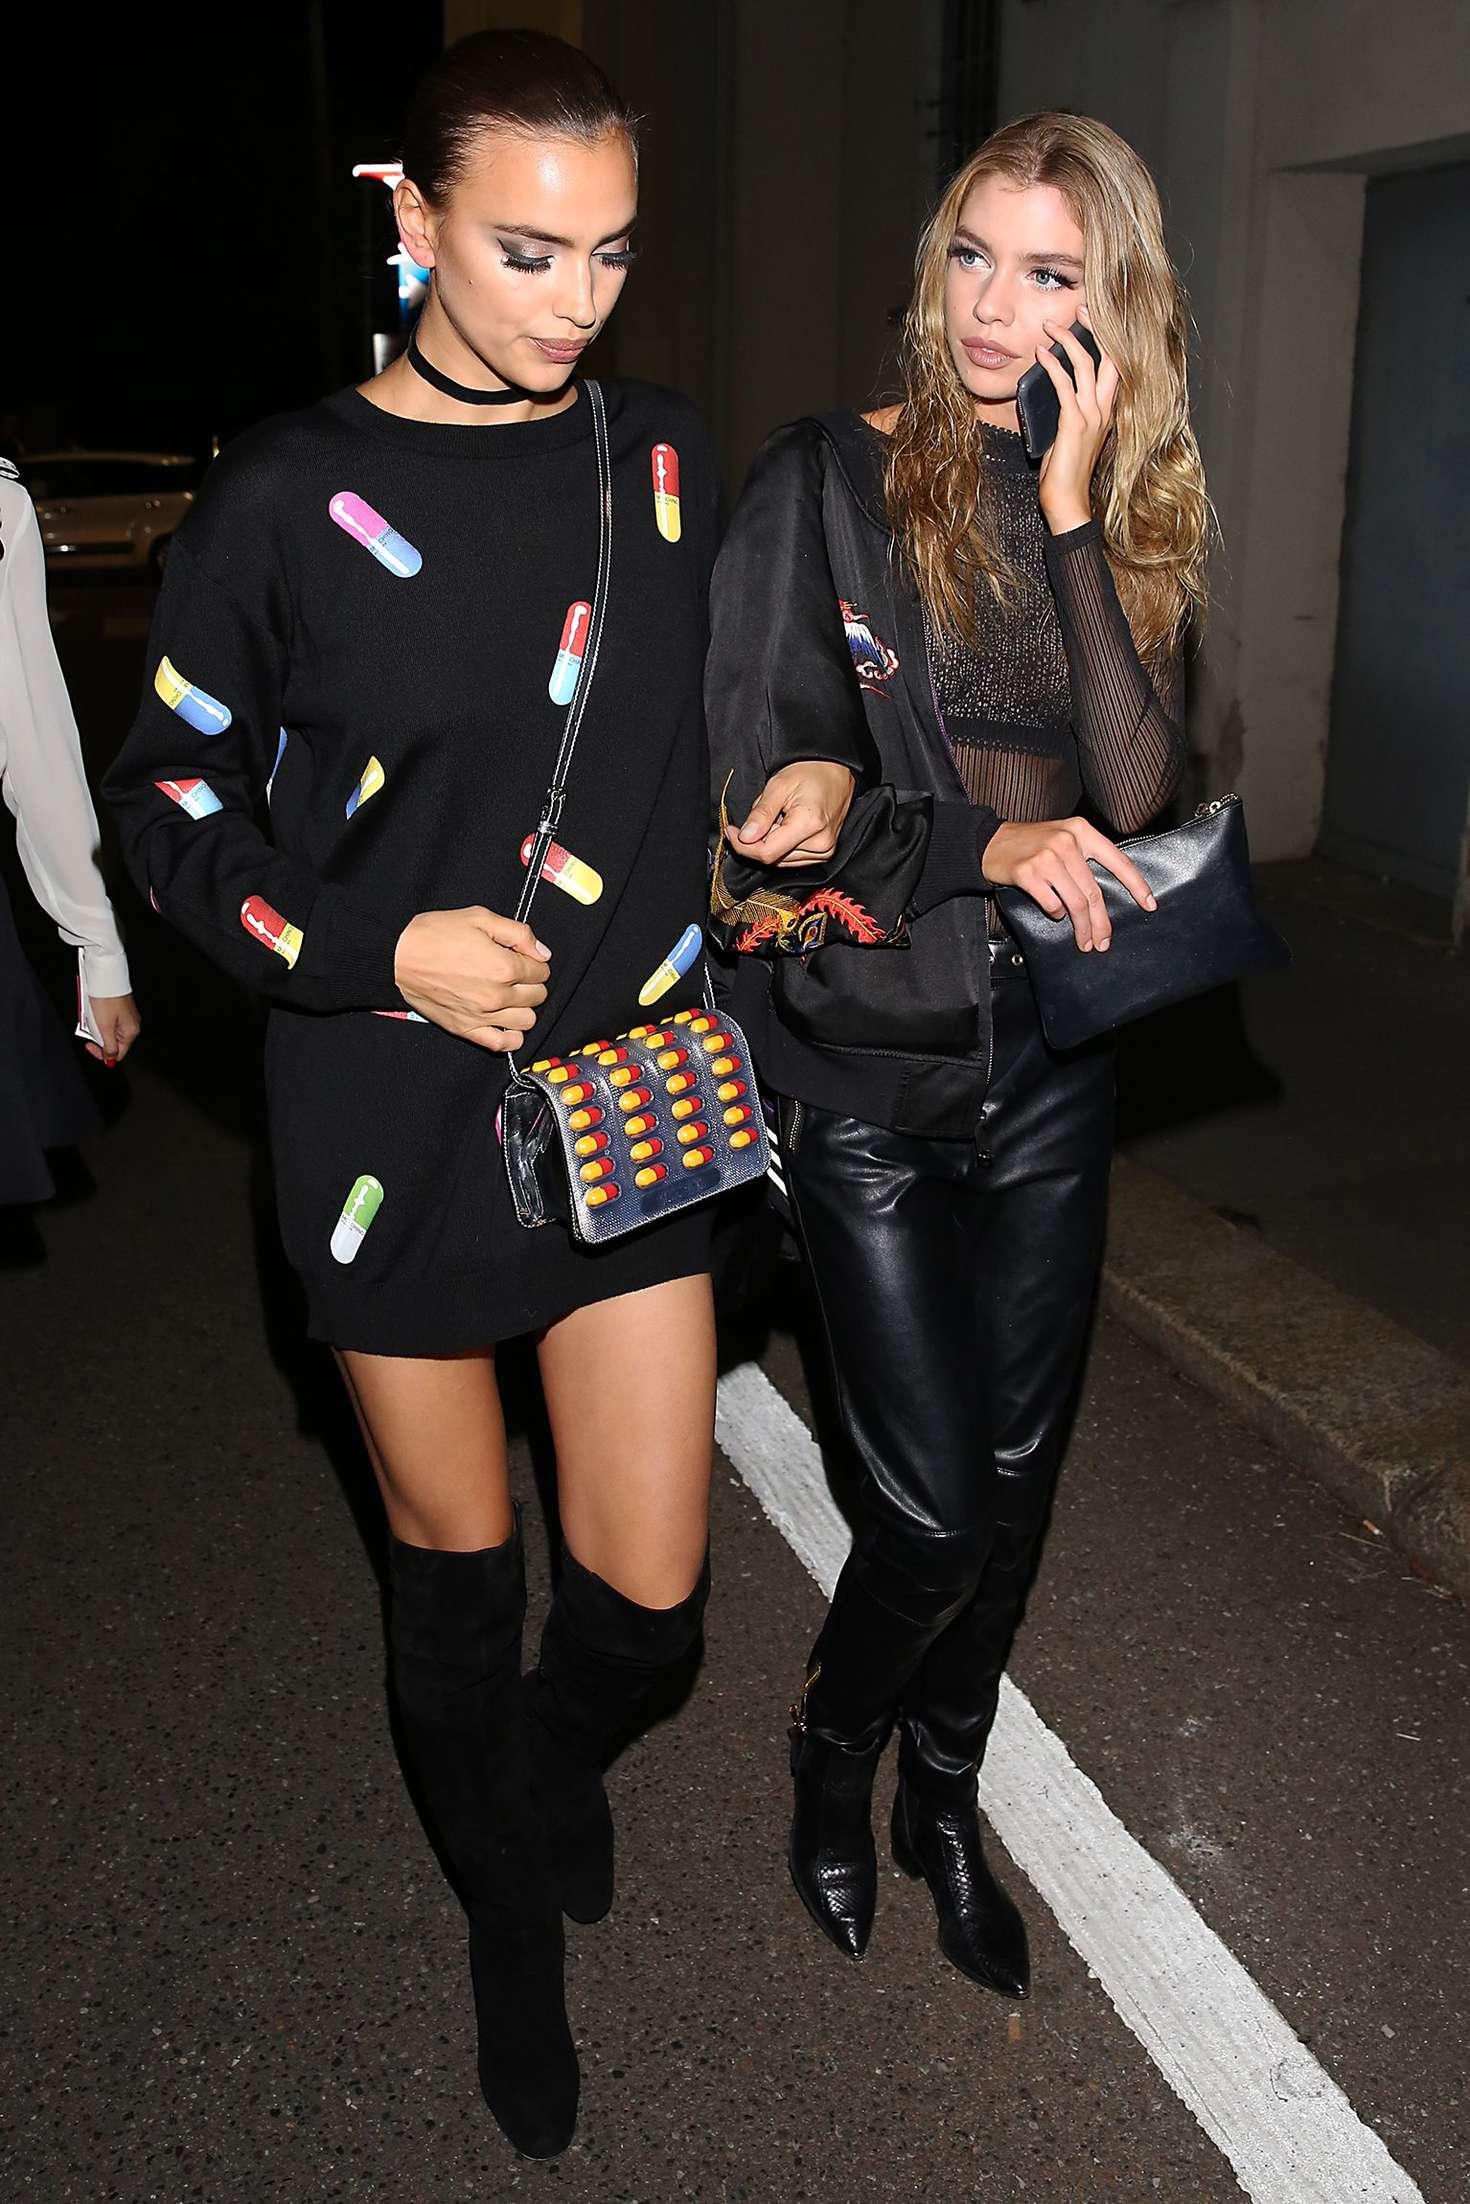 Irina Shayk 2016 : Irina Shayk and Stella Maxwell Leaving Moschino Show 2017 at Milan Fashion Week -03